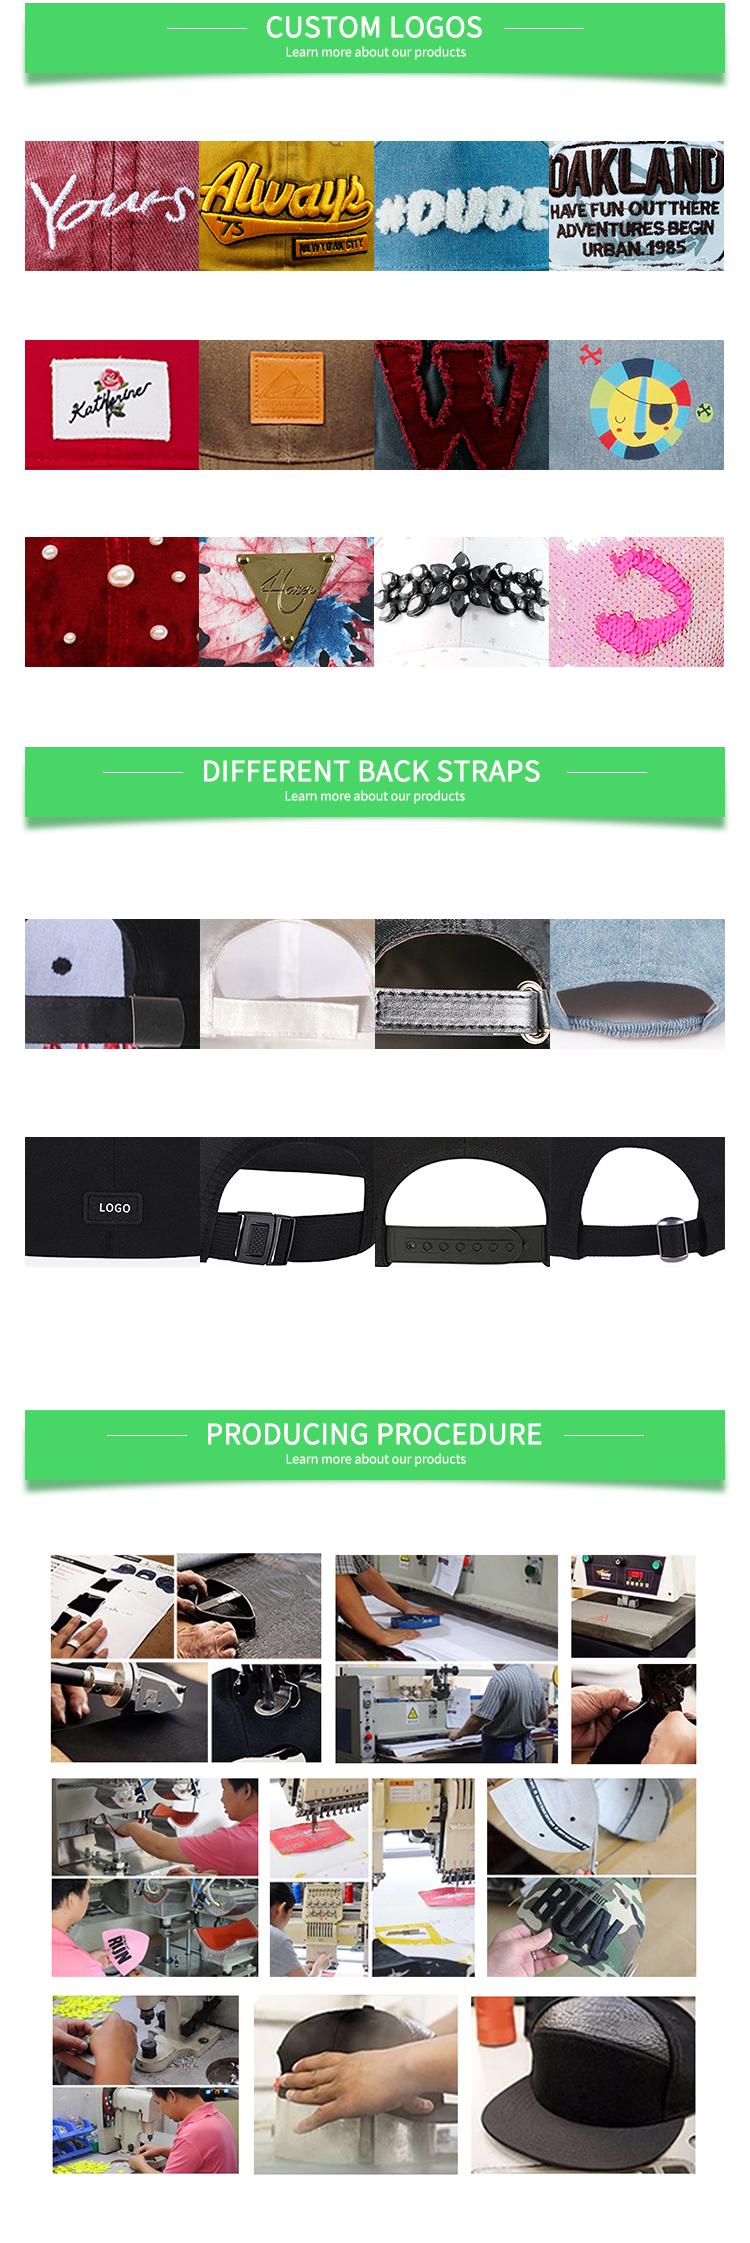 Fashion Desain Snapback Kualitas Tinggi 3D Bordir 6 Panel Bisbol Cap Topi